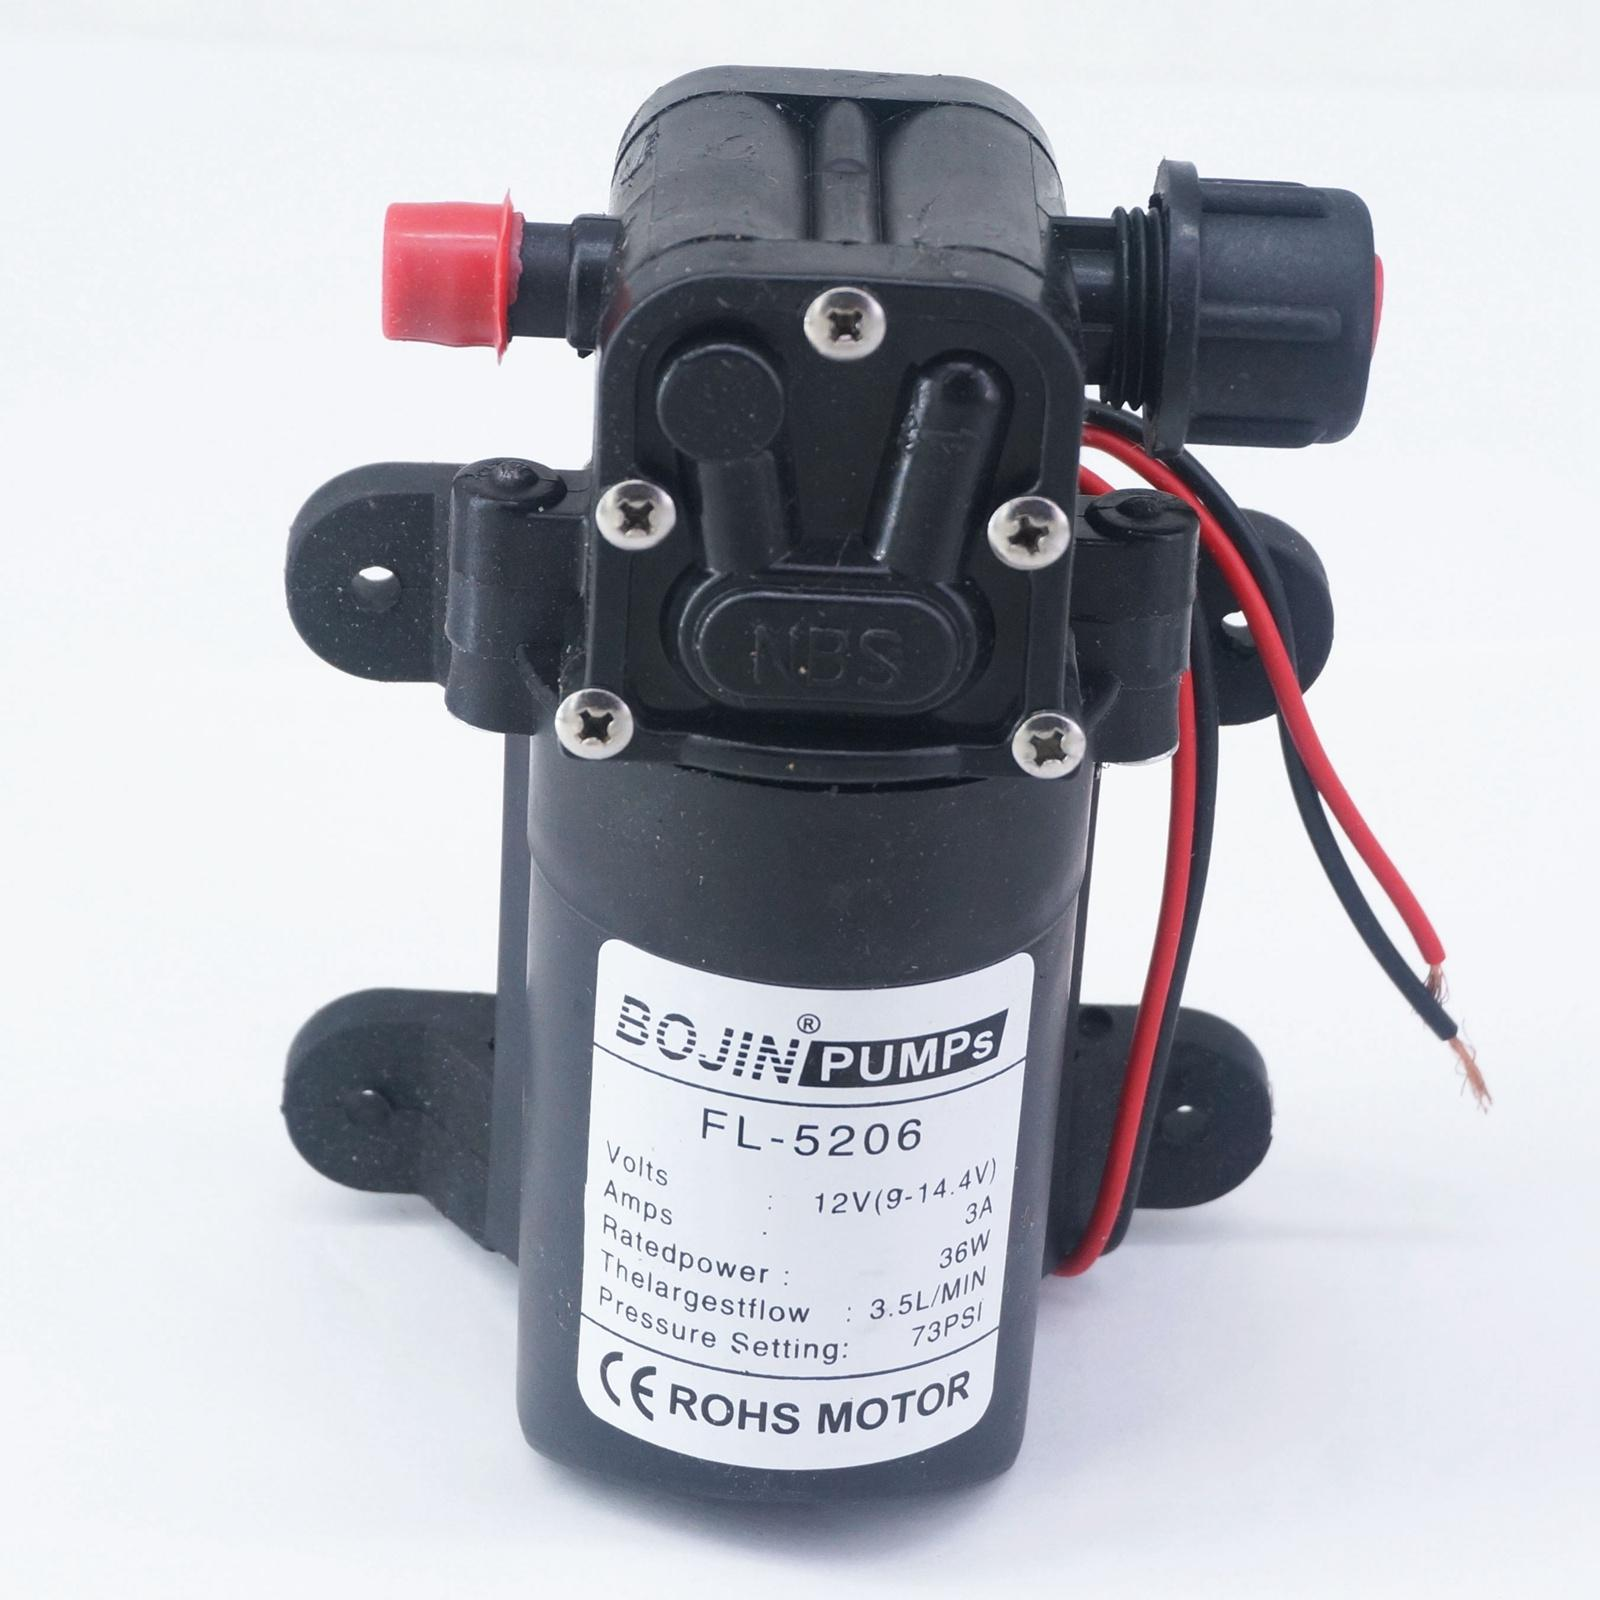 12V DC Electric Mini Diaphragm pump self-priming booster pumnp for garden cooling car washer 3A 36W 210L/H T26